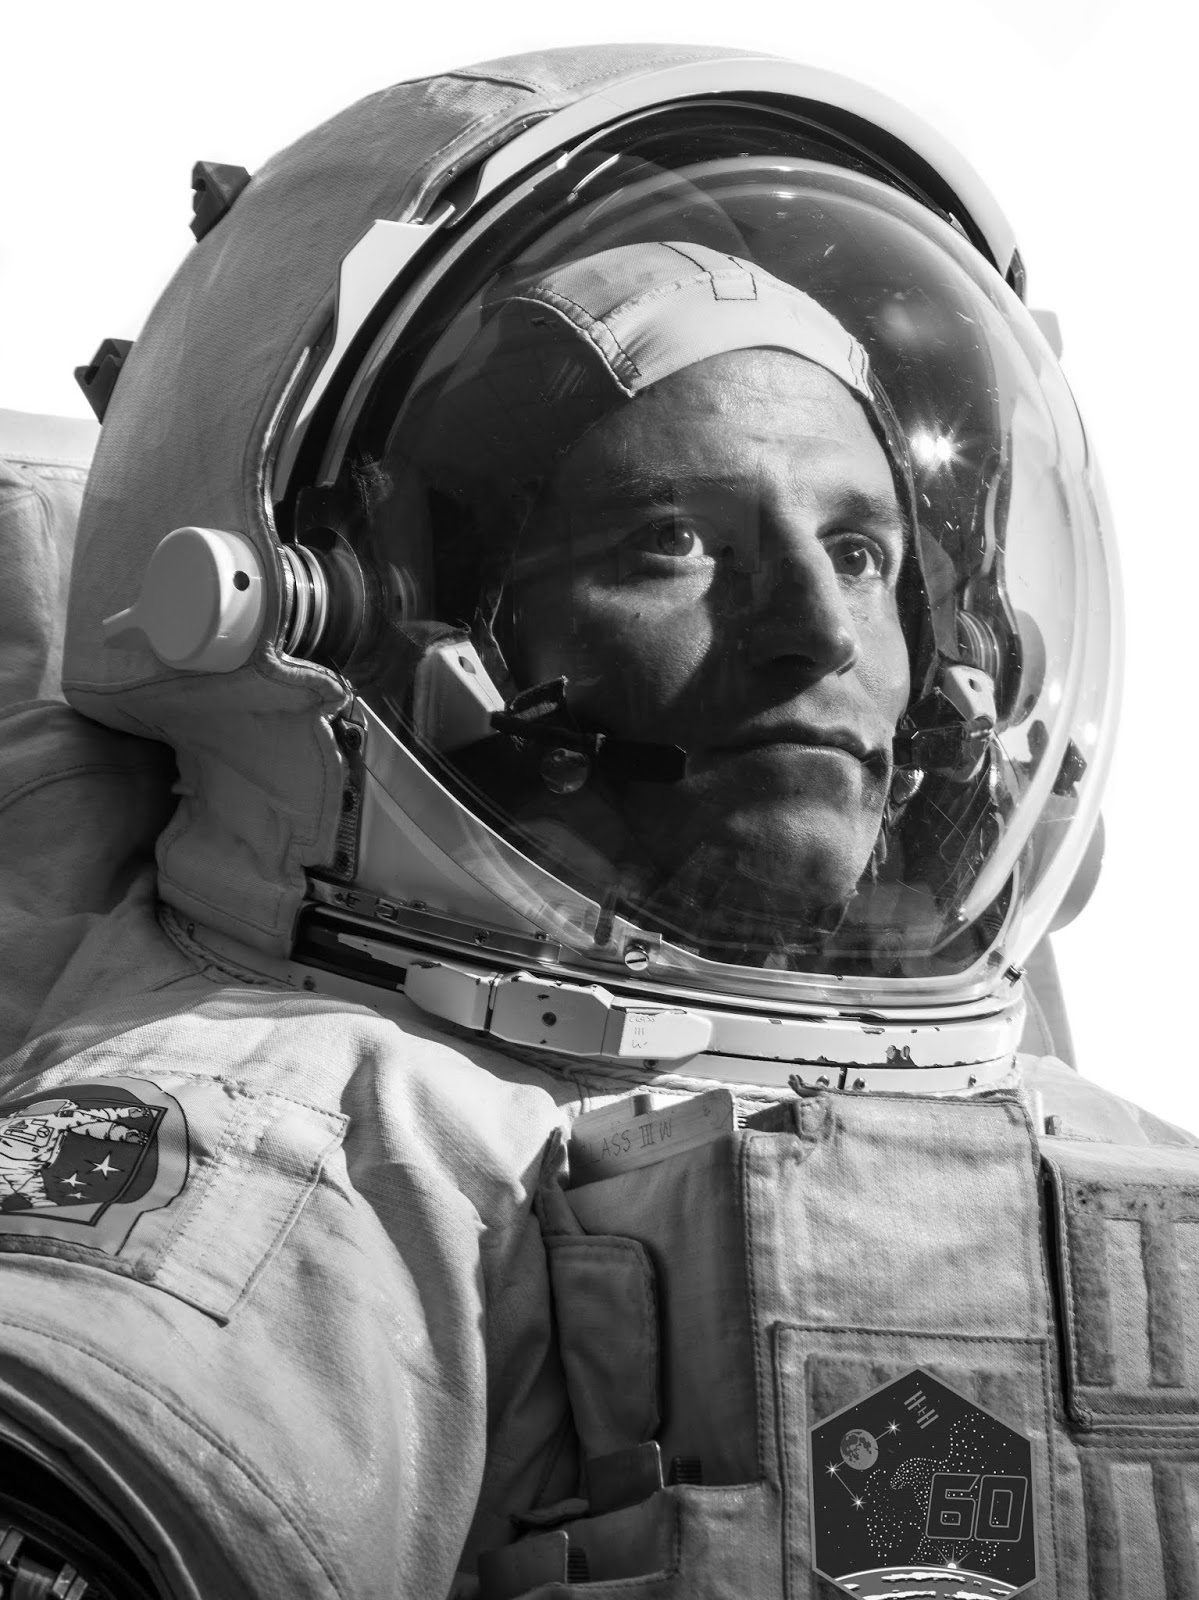 Morgan in a space suit